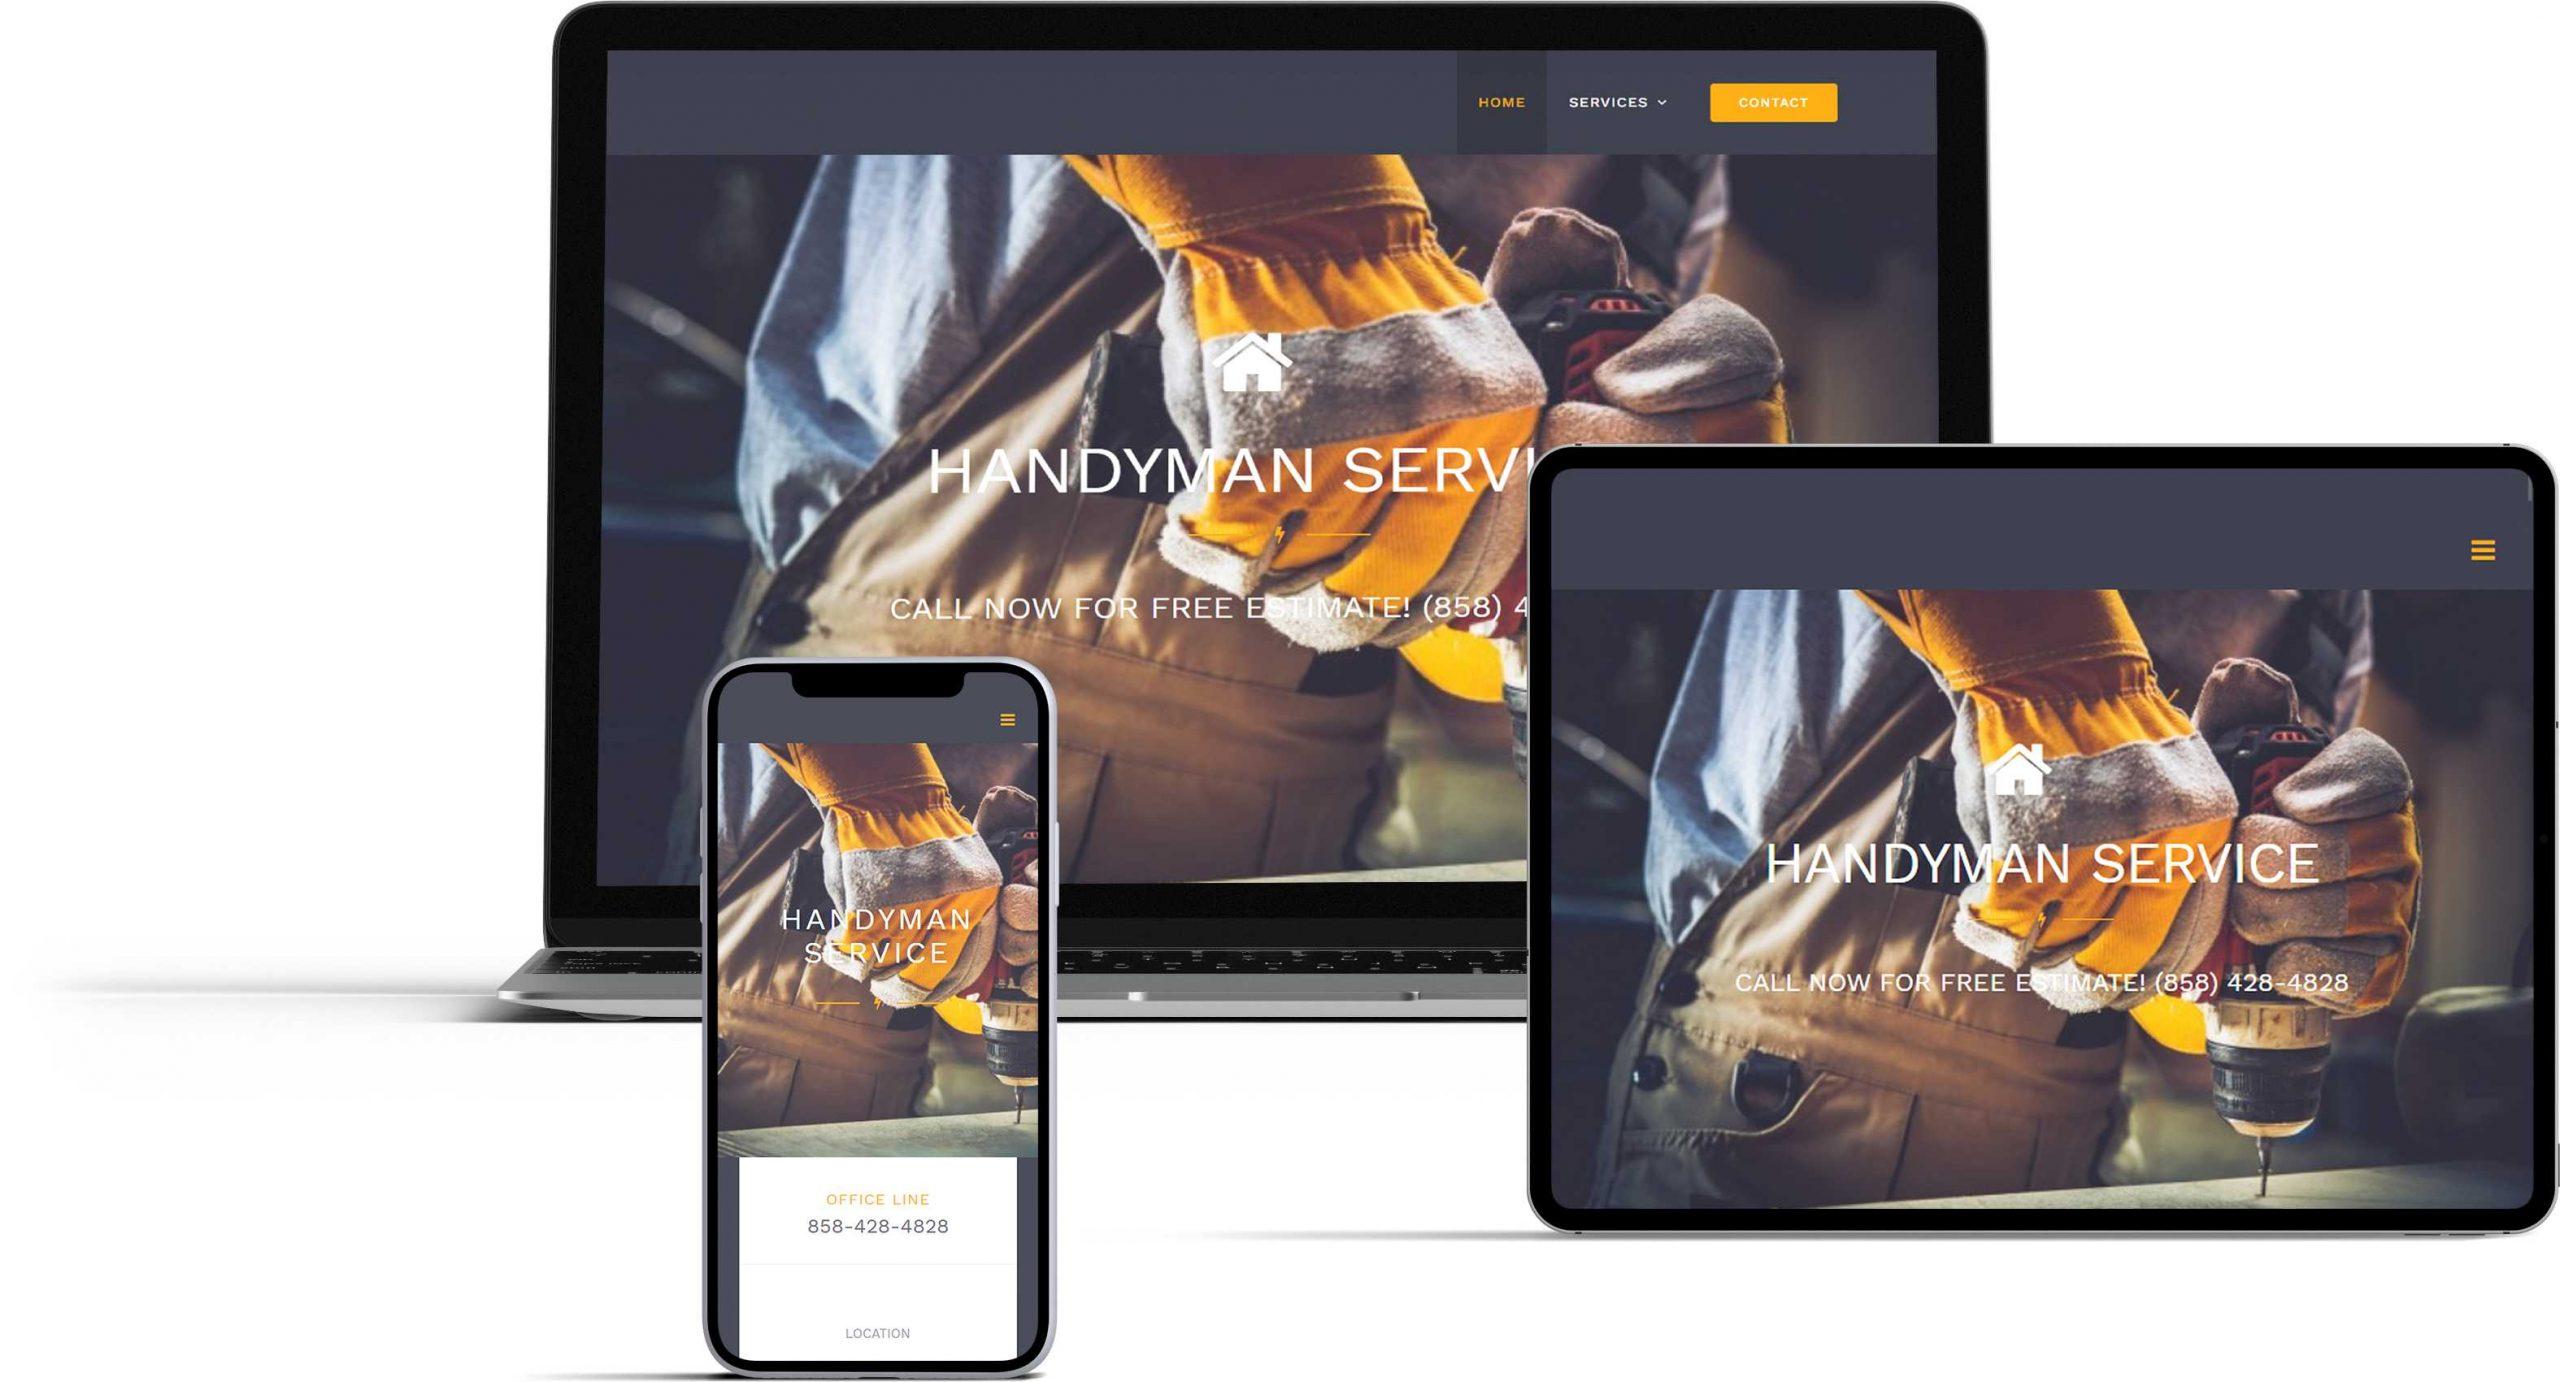 handyman website